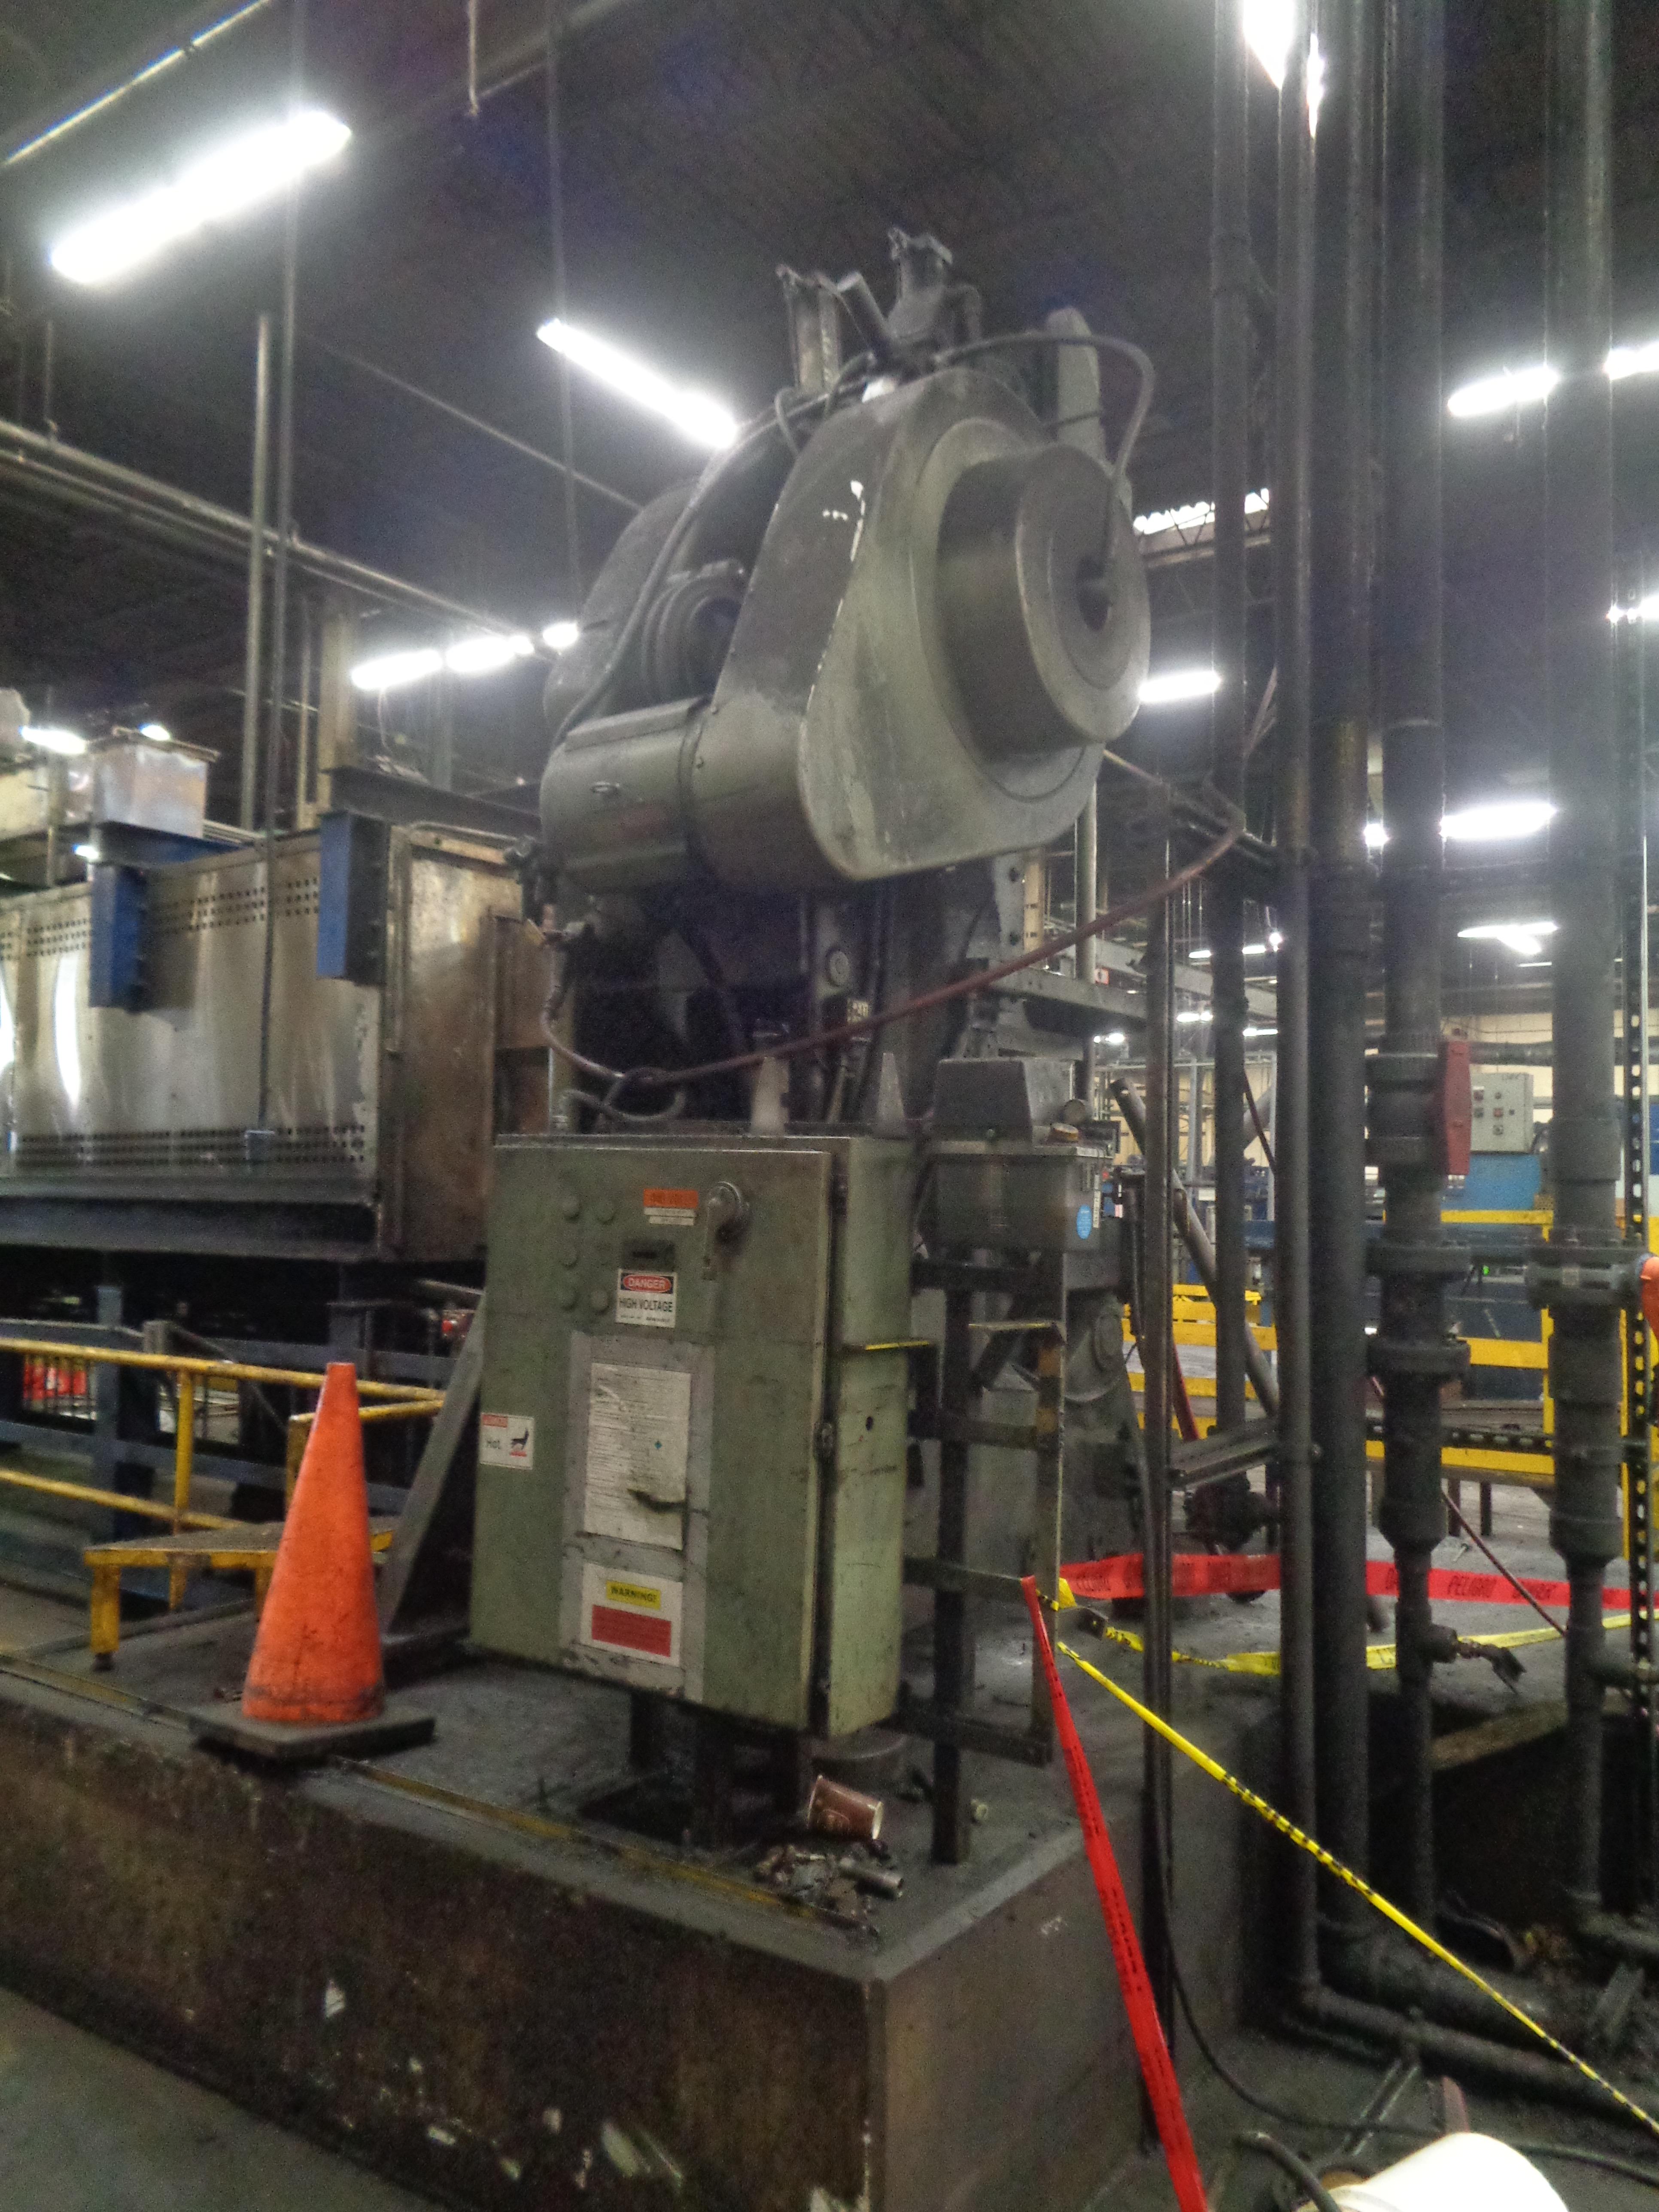 South Bend Press 125 Ton Located in Swedsboro NJ - Image 4 of 6